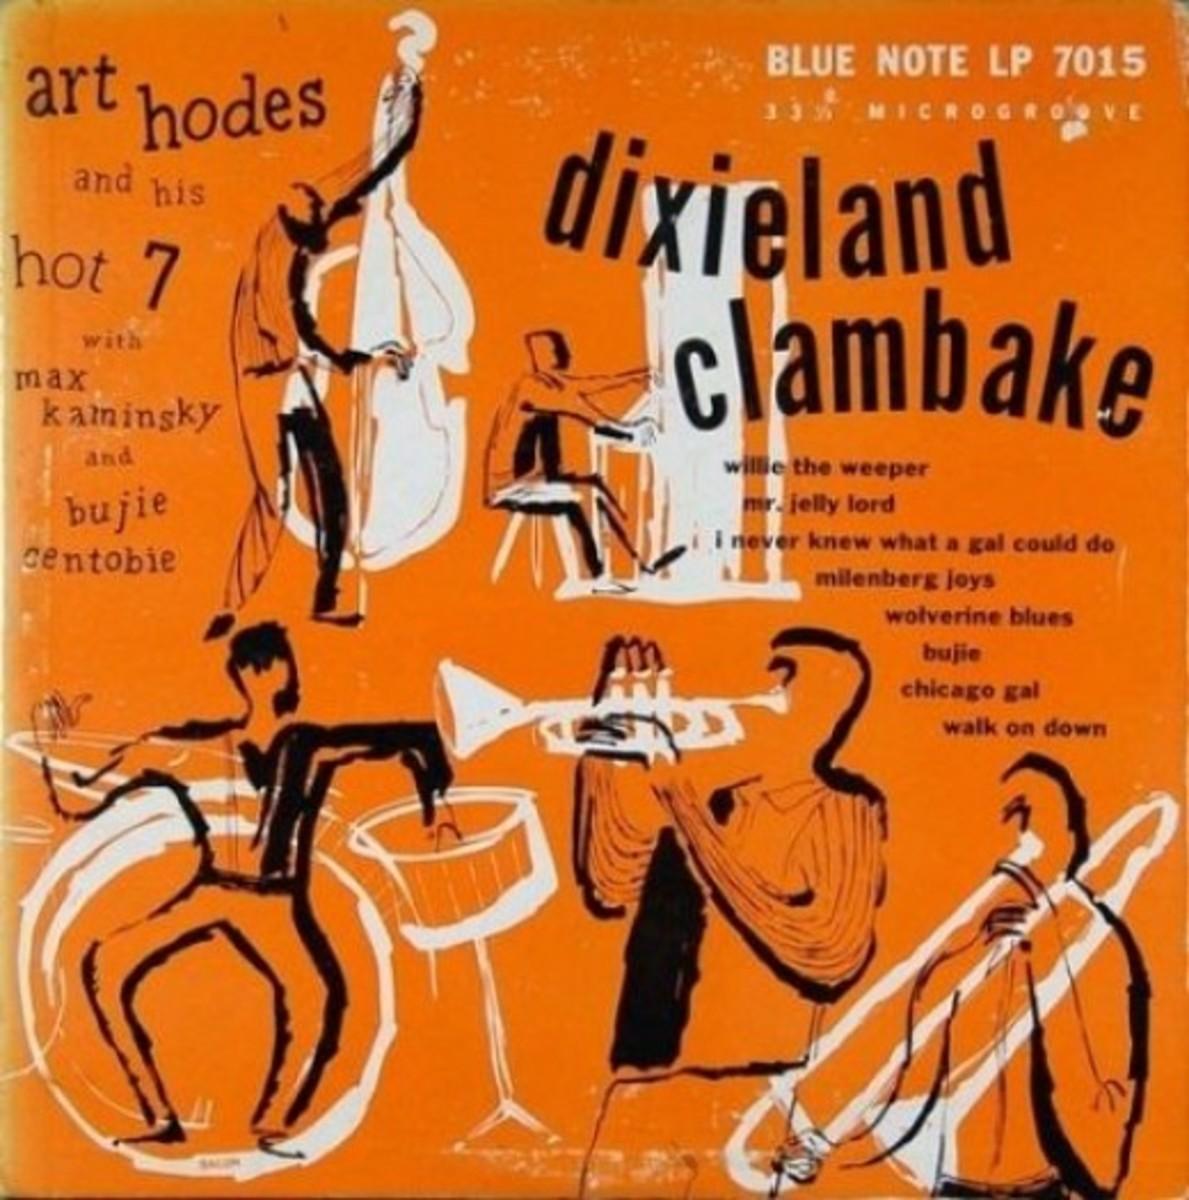 "Art Hodes & His Hot 7 ""Dixieland Clambake"" BLP 7015  10"" LP Vinyl Microgroove Record  (1951) Cover Art & Design by Paul Bacon"